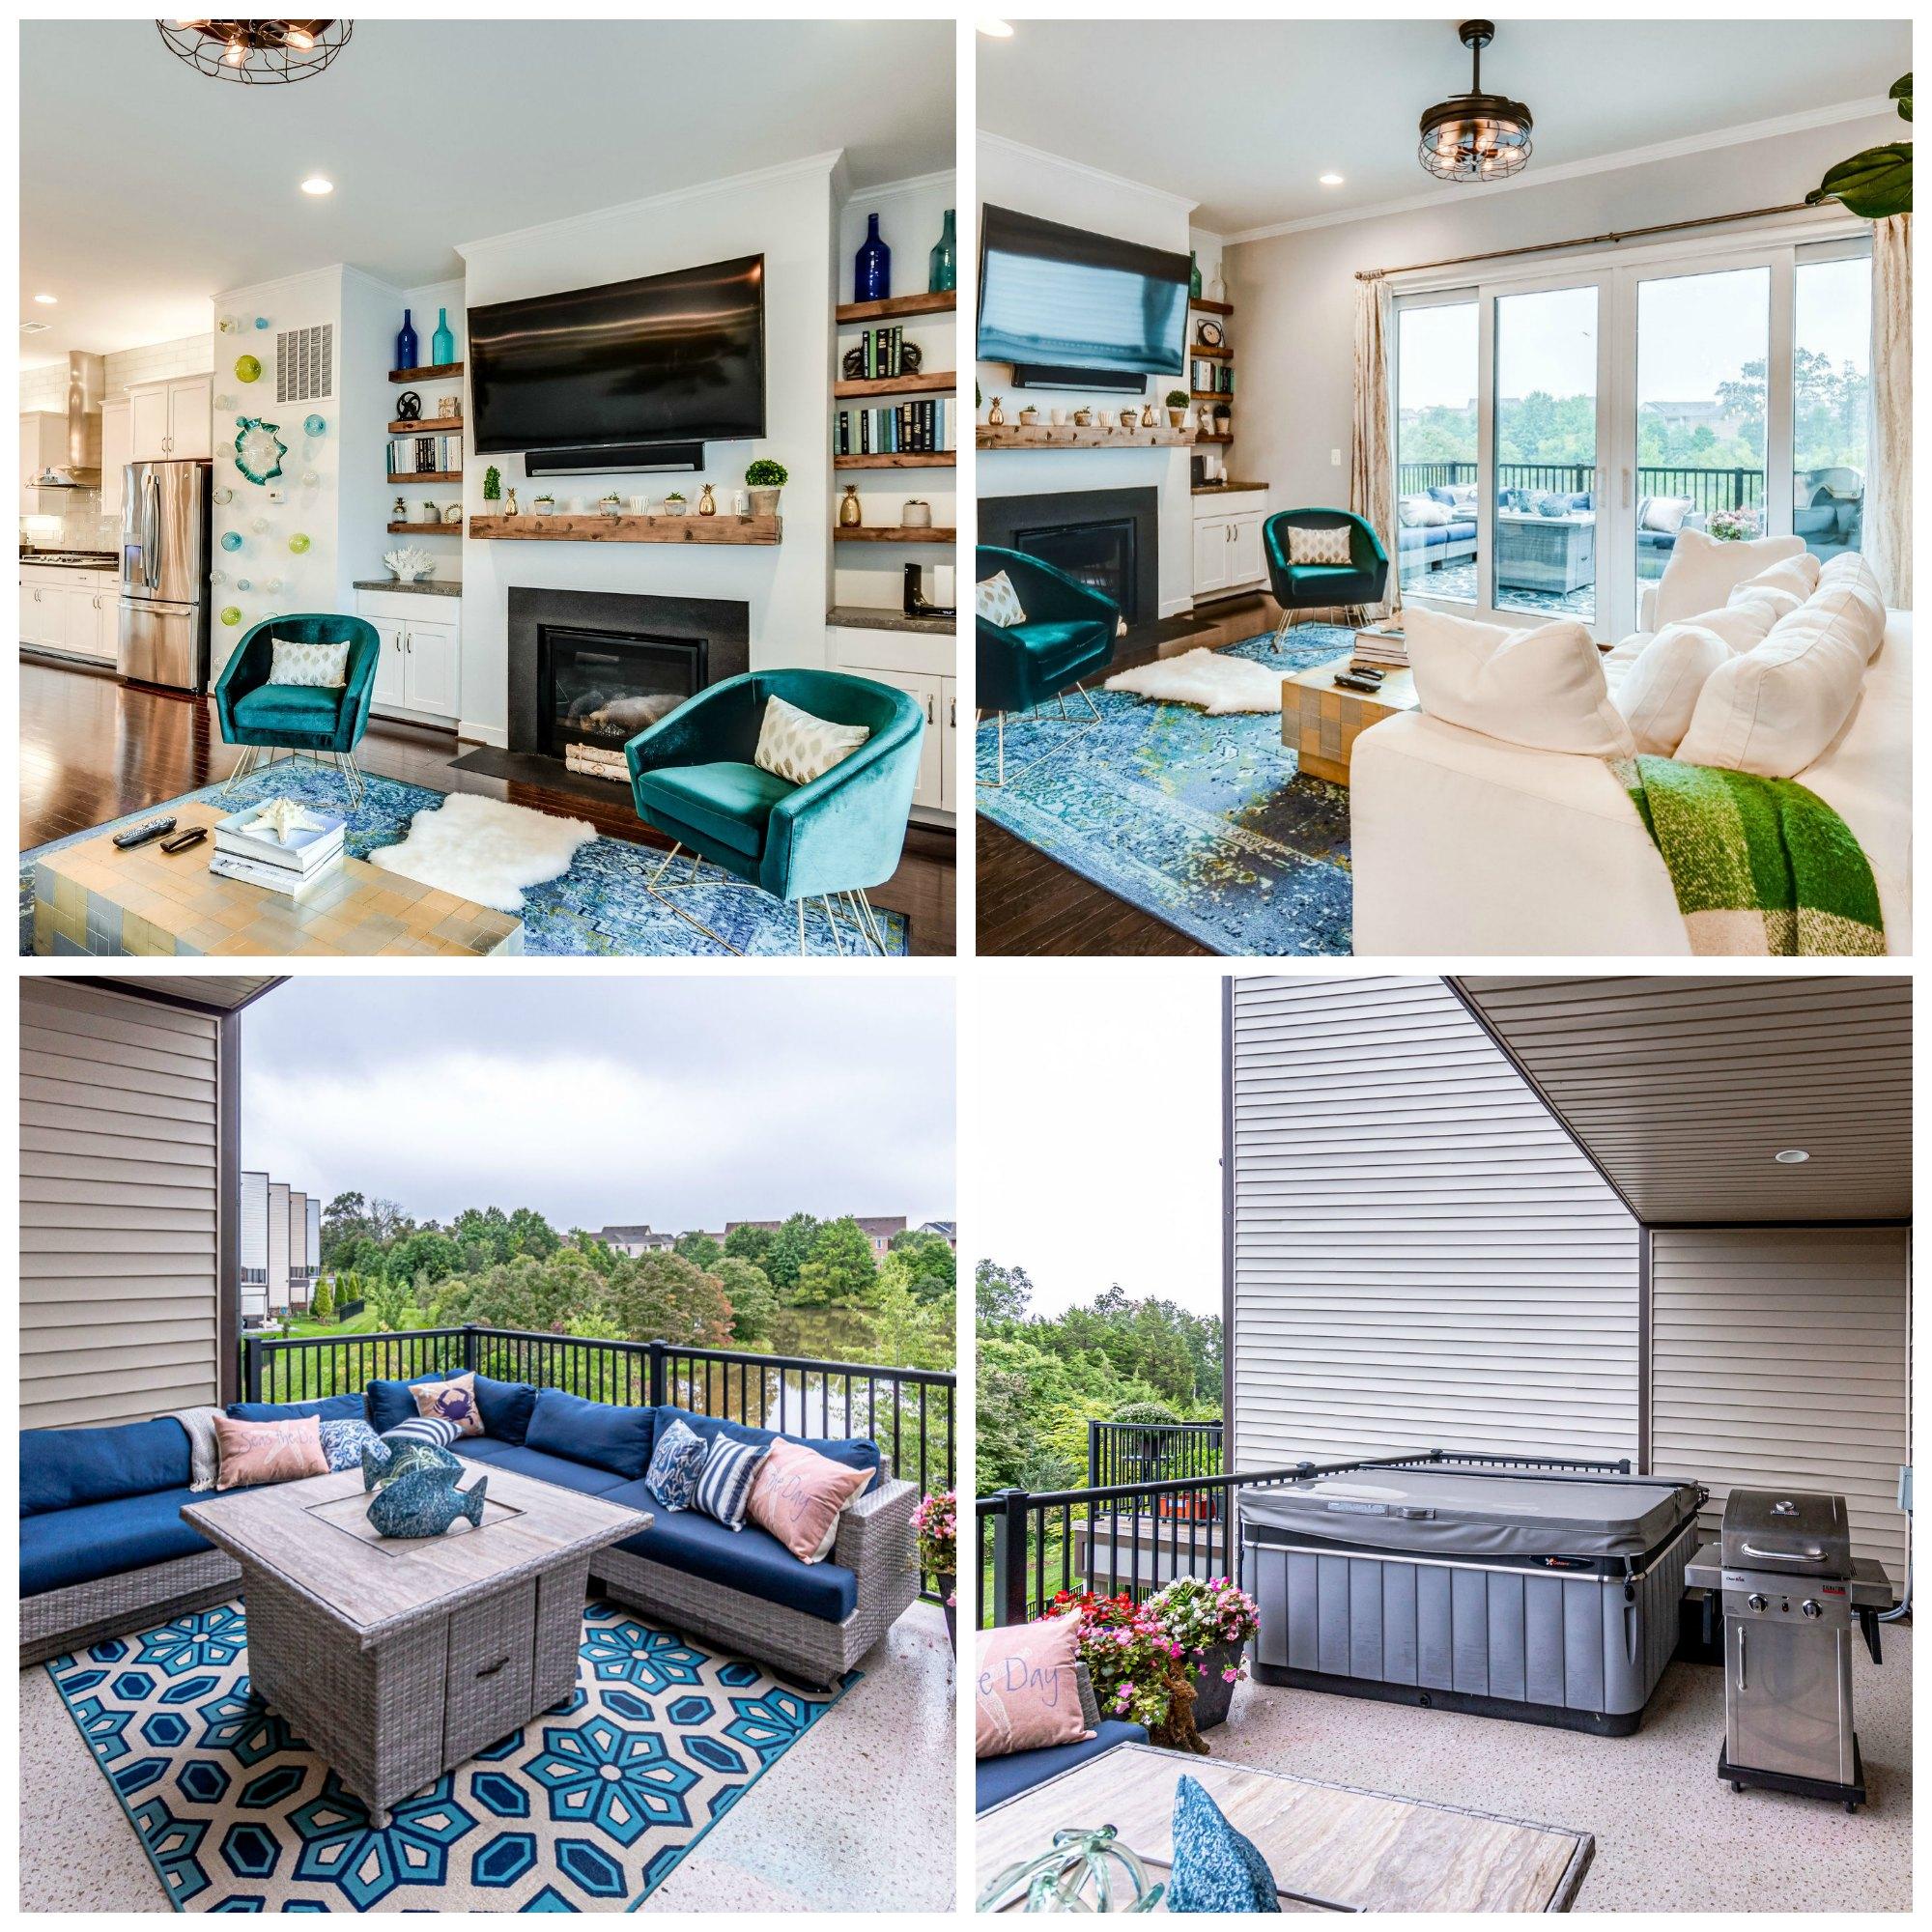 23094 Sullivans Cove Sq, Brambleton- Great Room and Deck